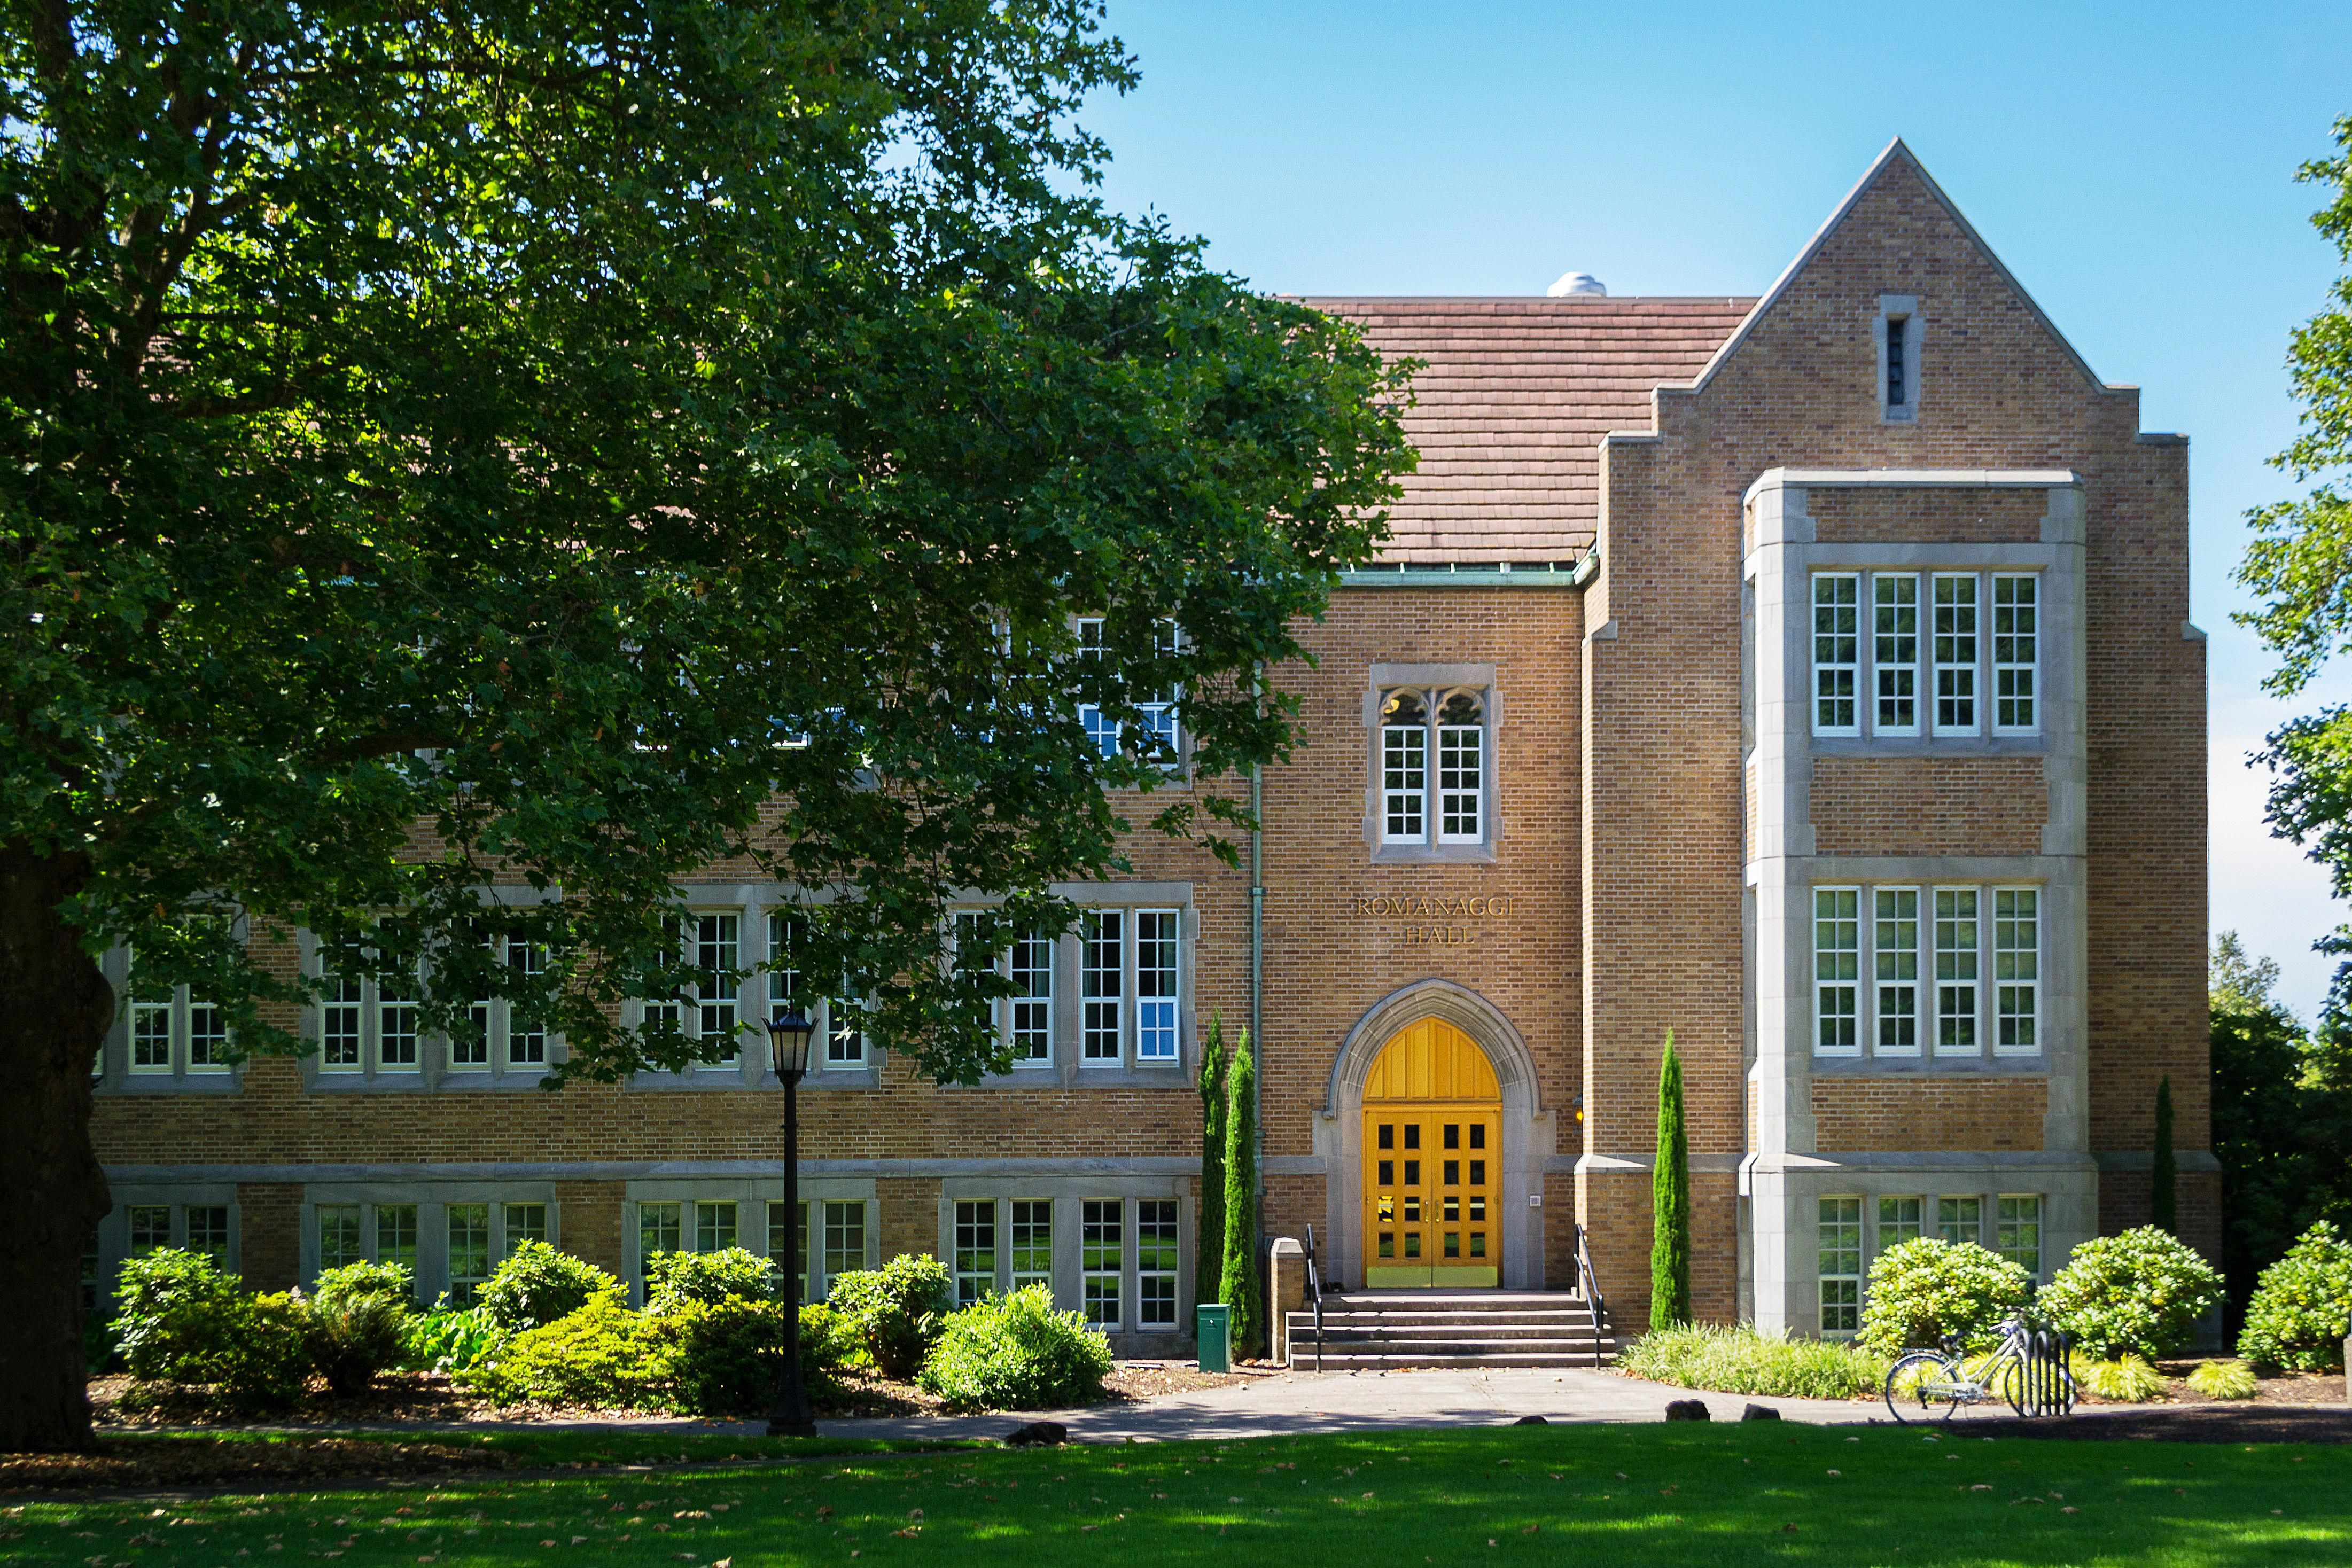 Romanaggi Hall at the University of Portland